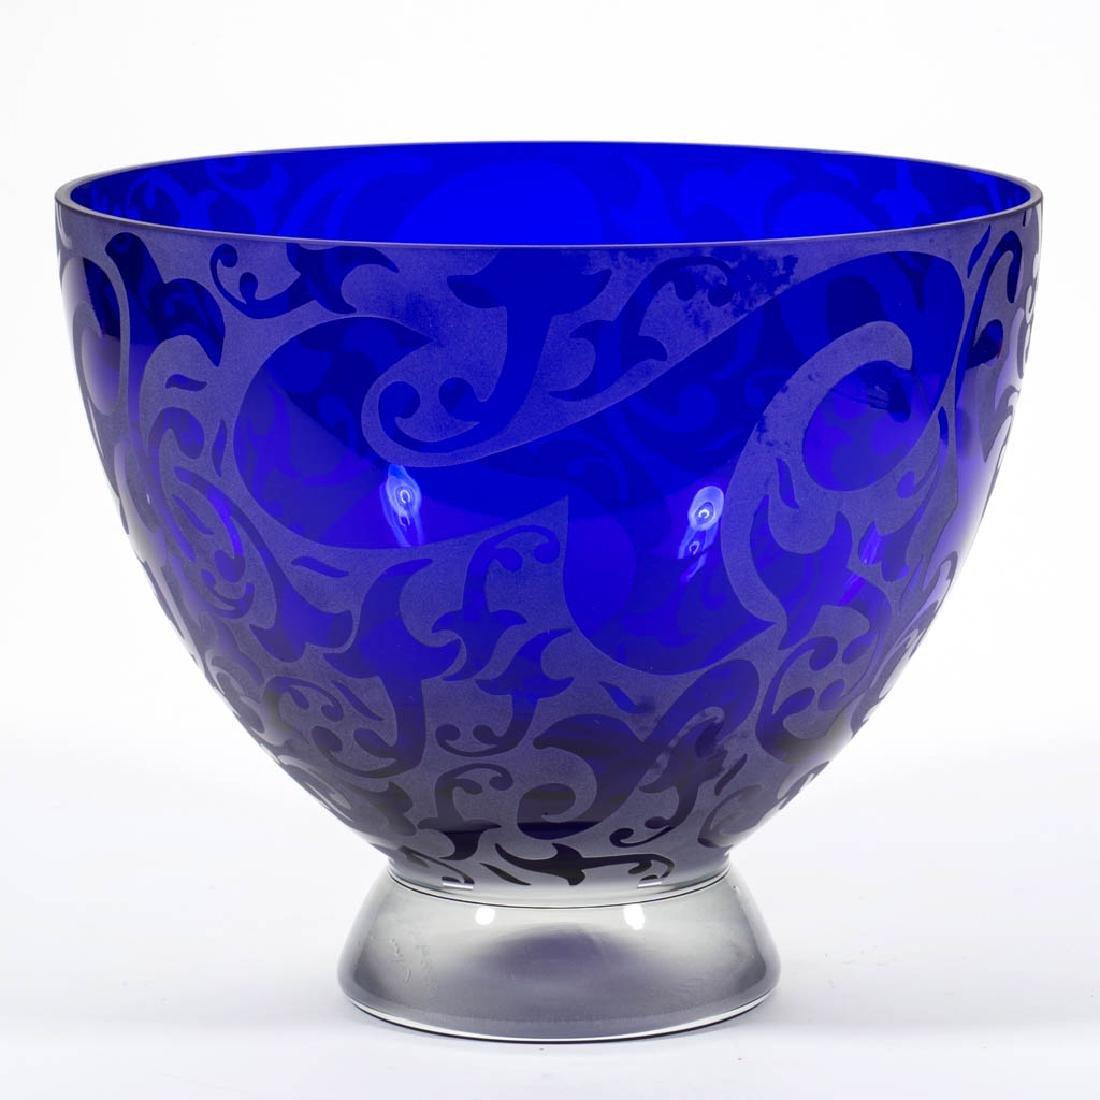 MICHAEL WEEMS ACID-ETCHED STUDIO ART GLASS BOWL